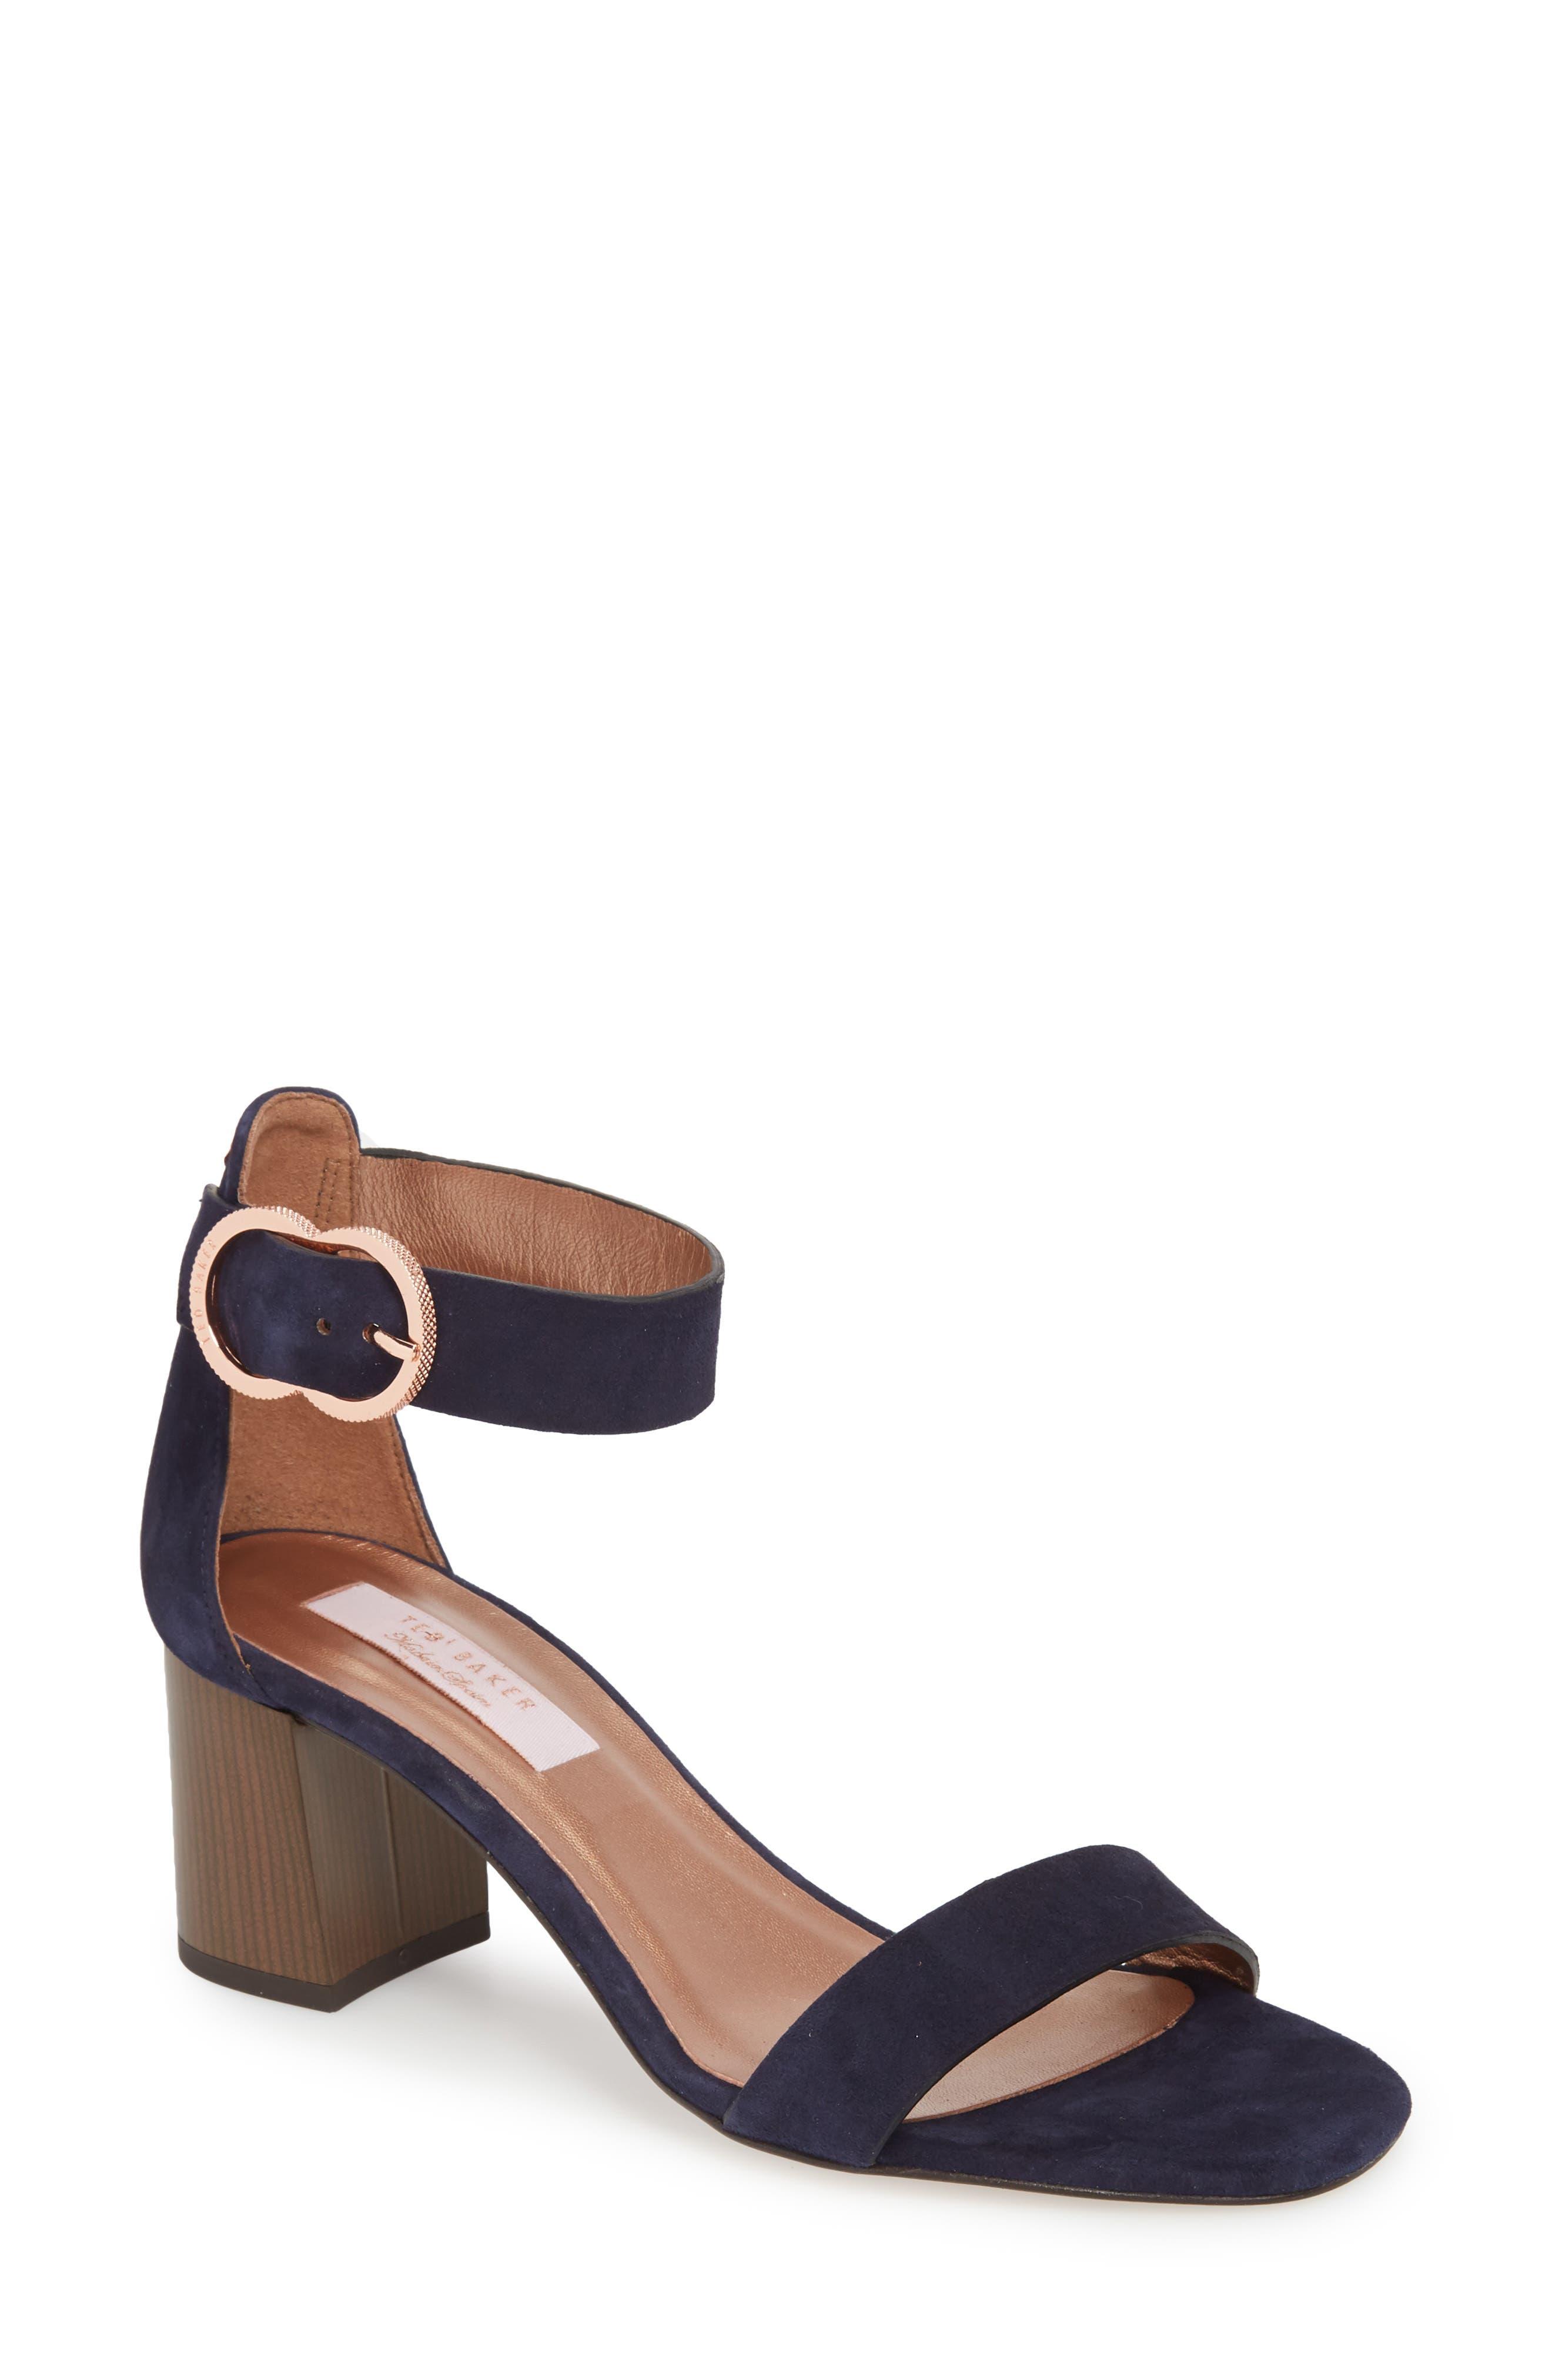 Qarvas Sandal,                             Main thumbnail 2, color,